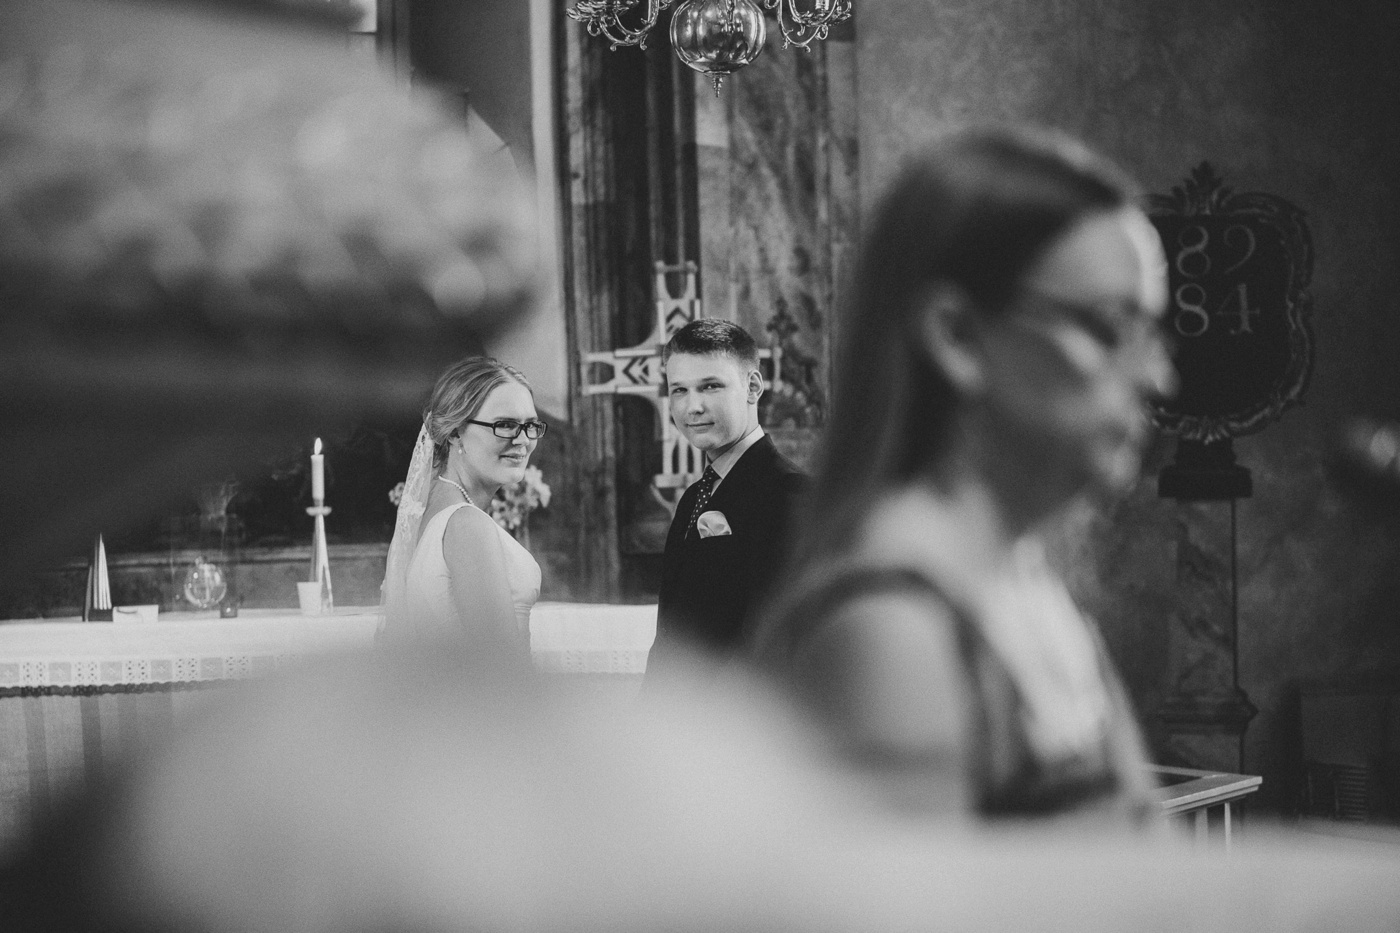 ceciliajoakim_sweden-countryside-summer-wedding_melbourne-fun-quirky-wedding-photography_14